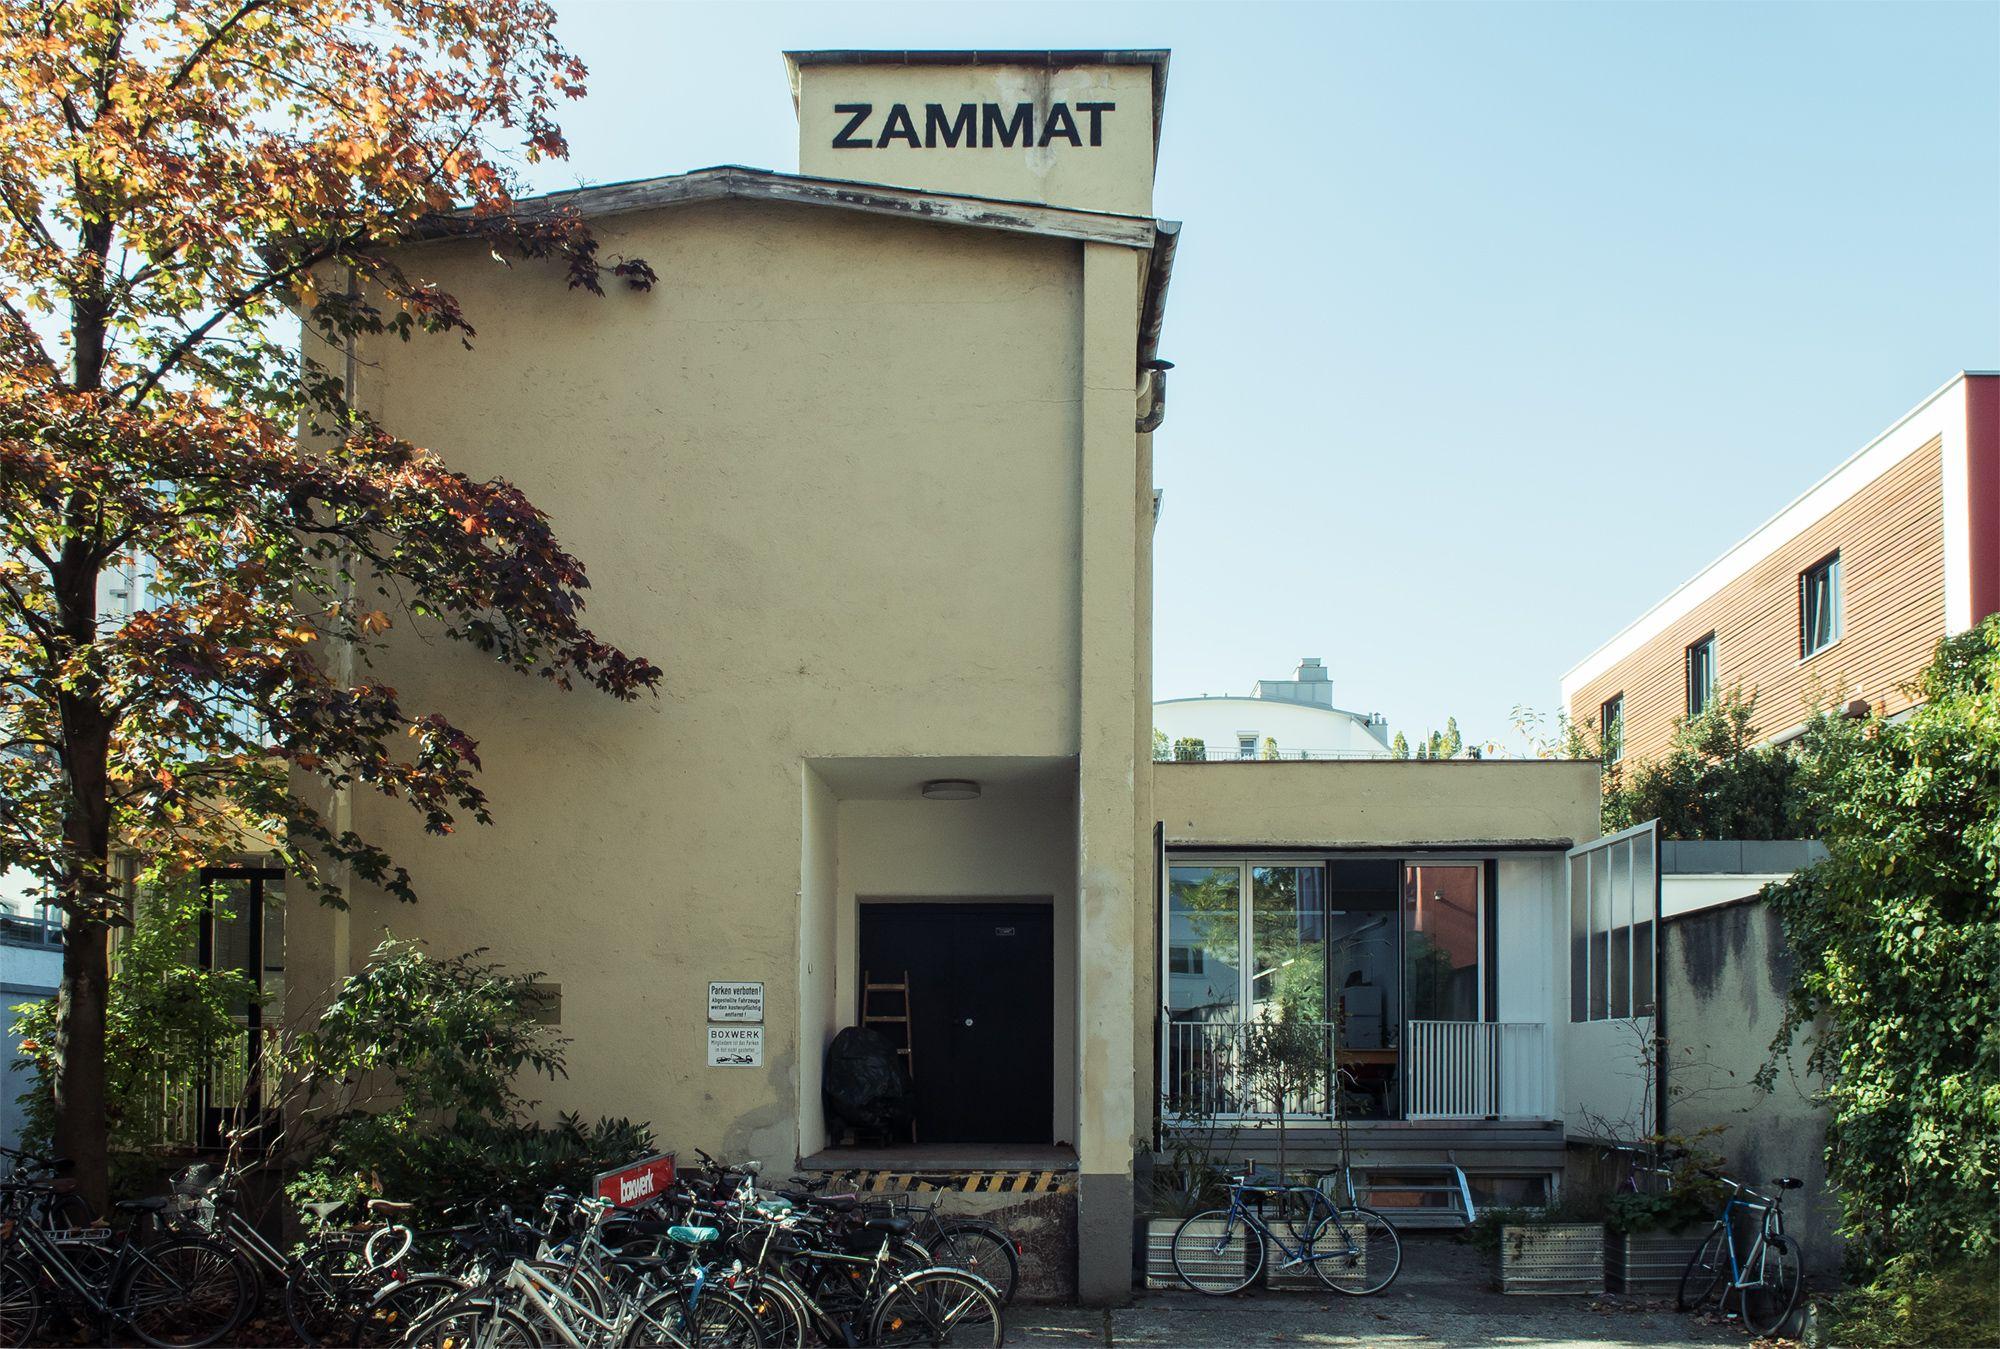 Zammat